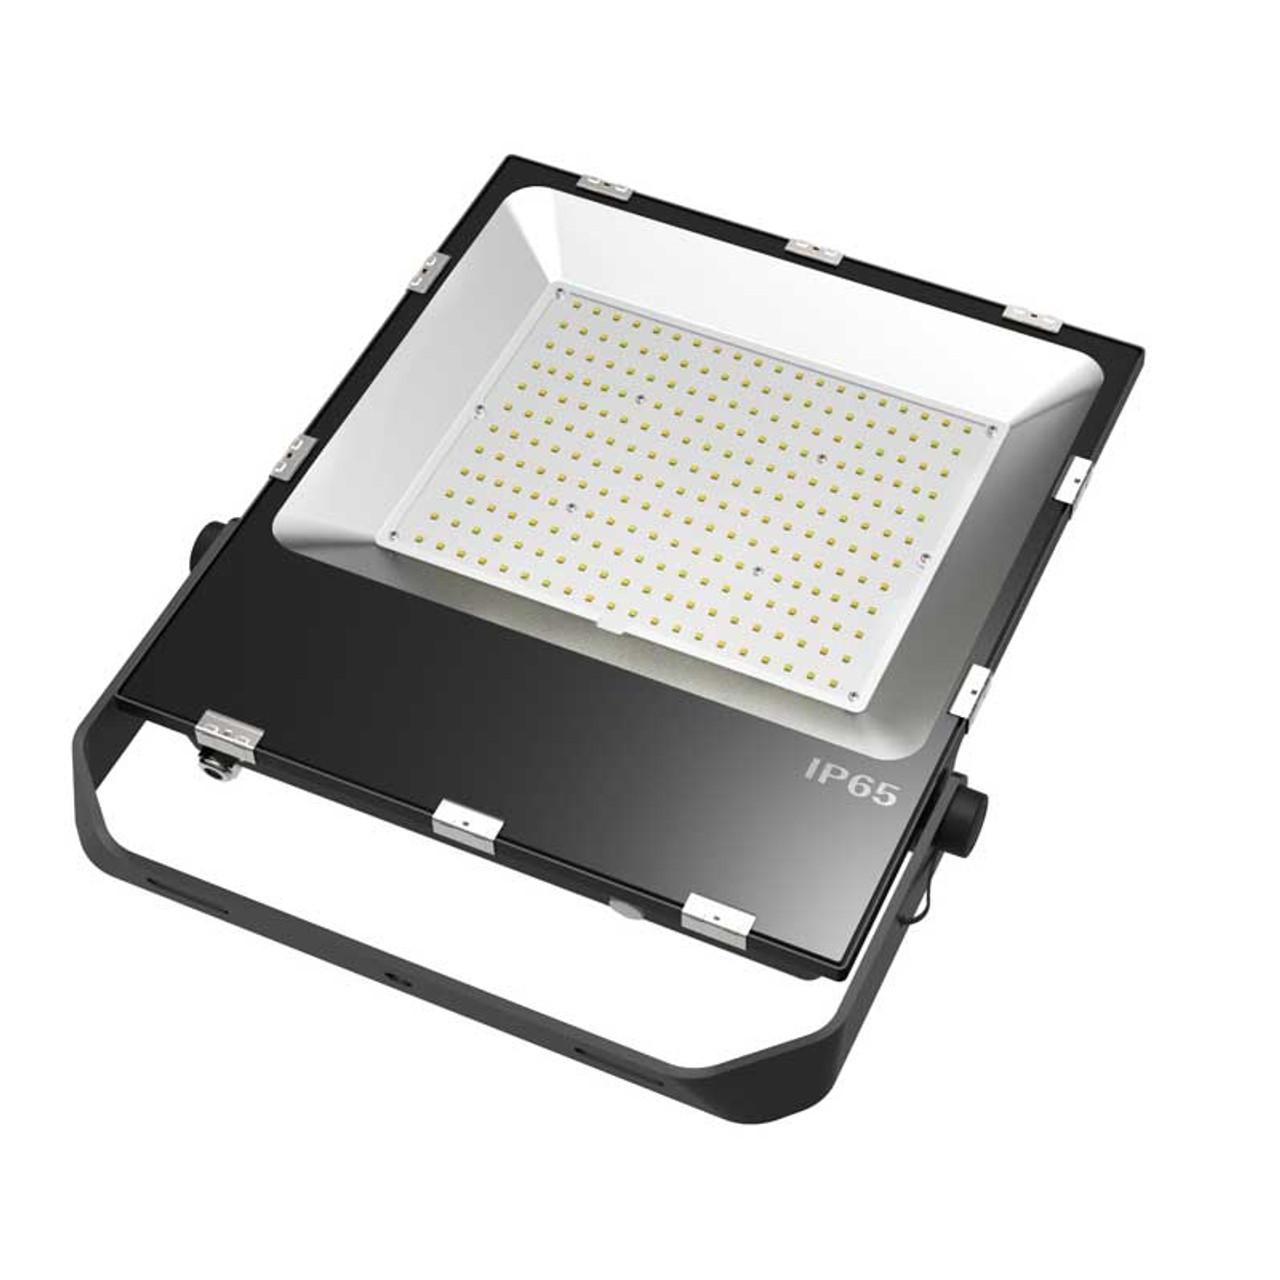 1000 Watt Metal Halide Led Replacement 1000 watt led flood light hid replacement, uses 200 watts, 24,000 lumen,  50,000 hours